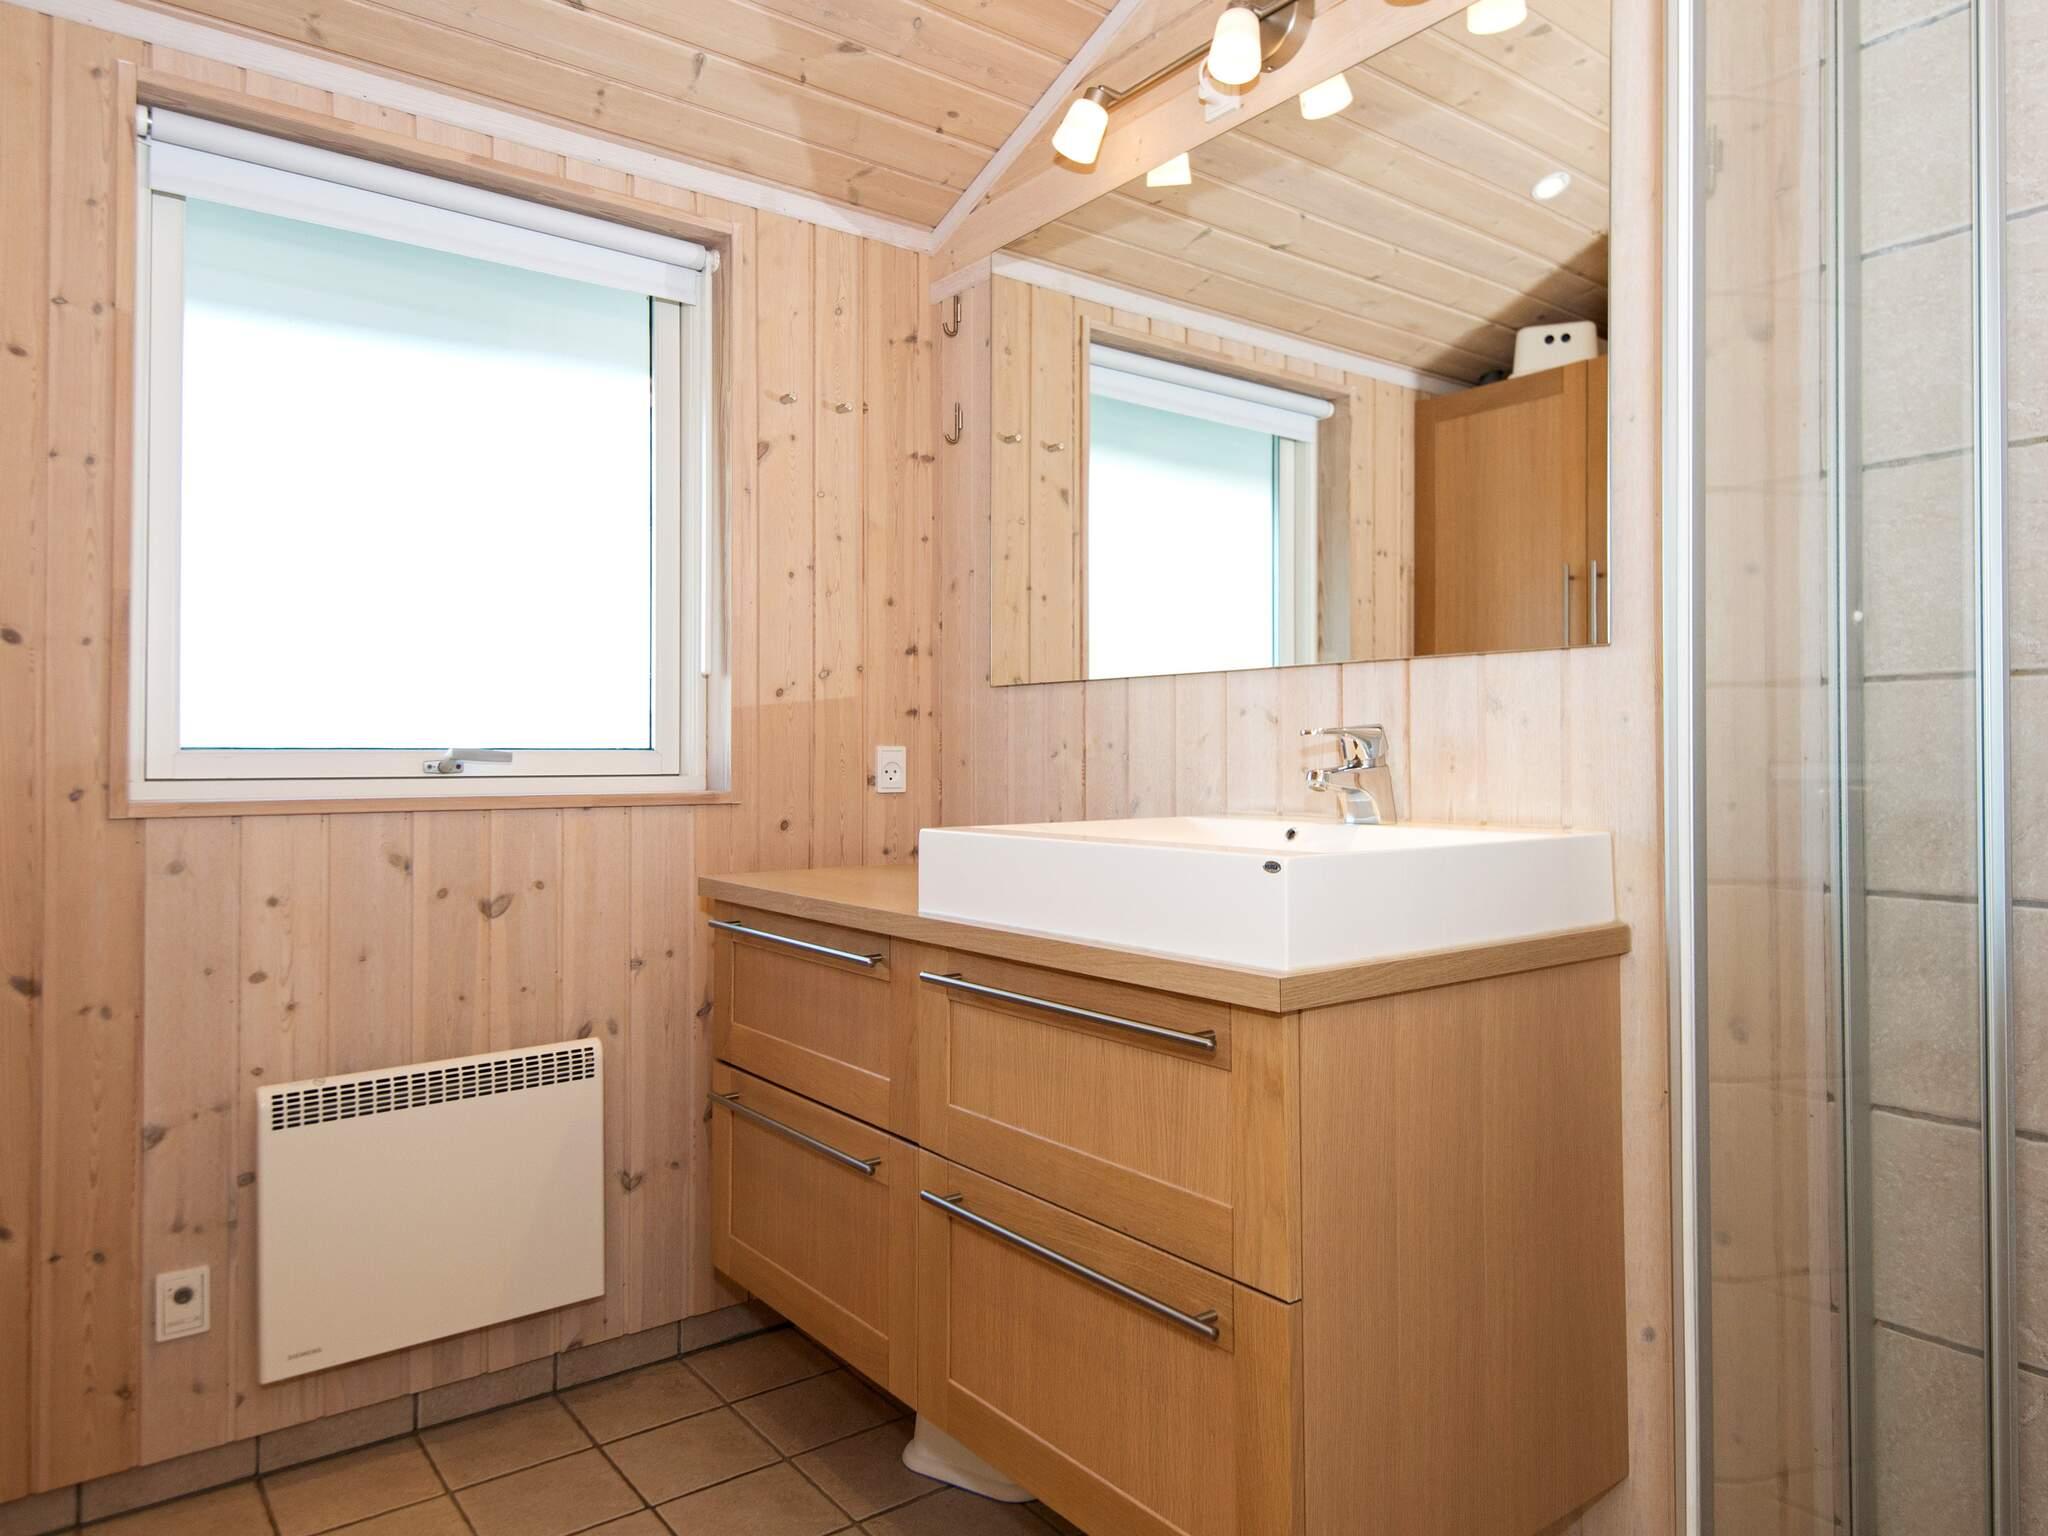 Maison de vacances Helgenæs (681779), Knebel, , Mer Baltique danoise, Danemark, image 13